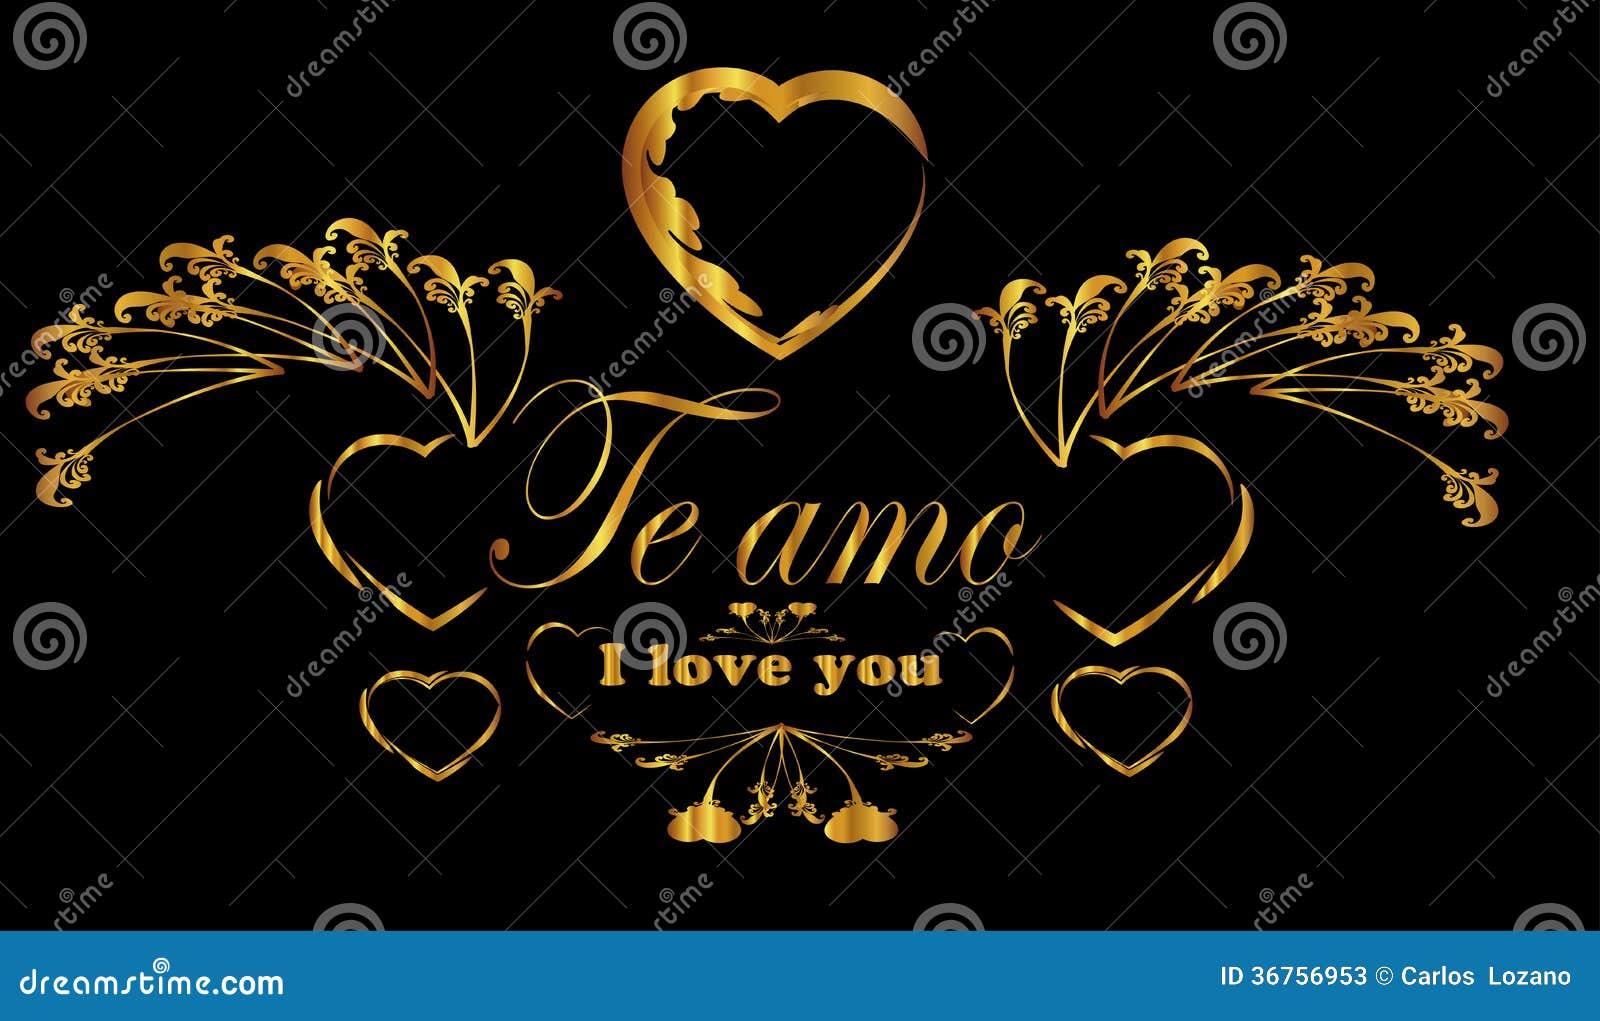 heart te amo frame stock photos image 36756953 black dog bone clipart big black dog clipart